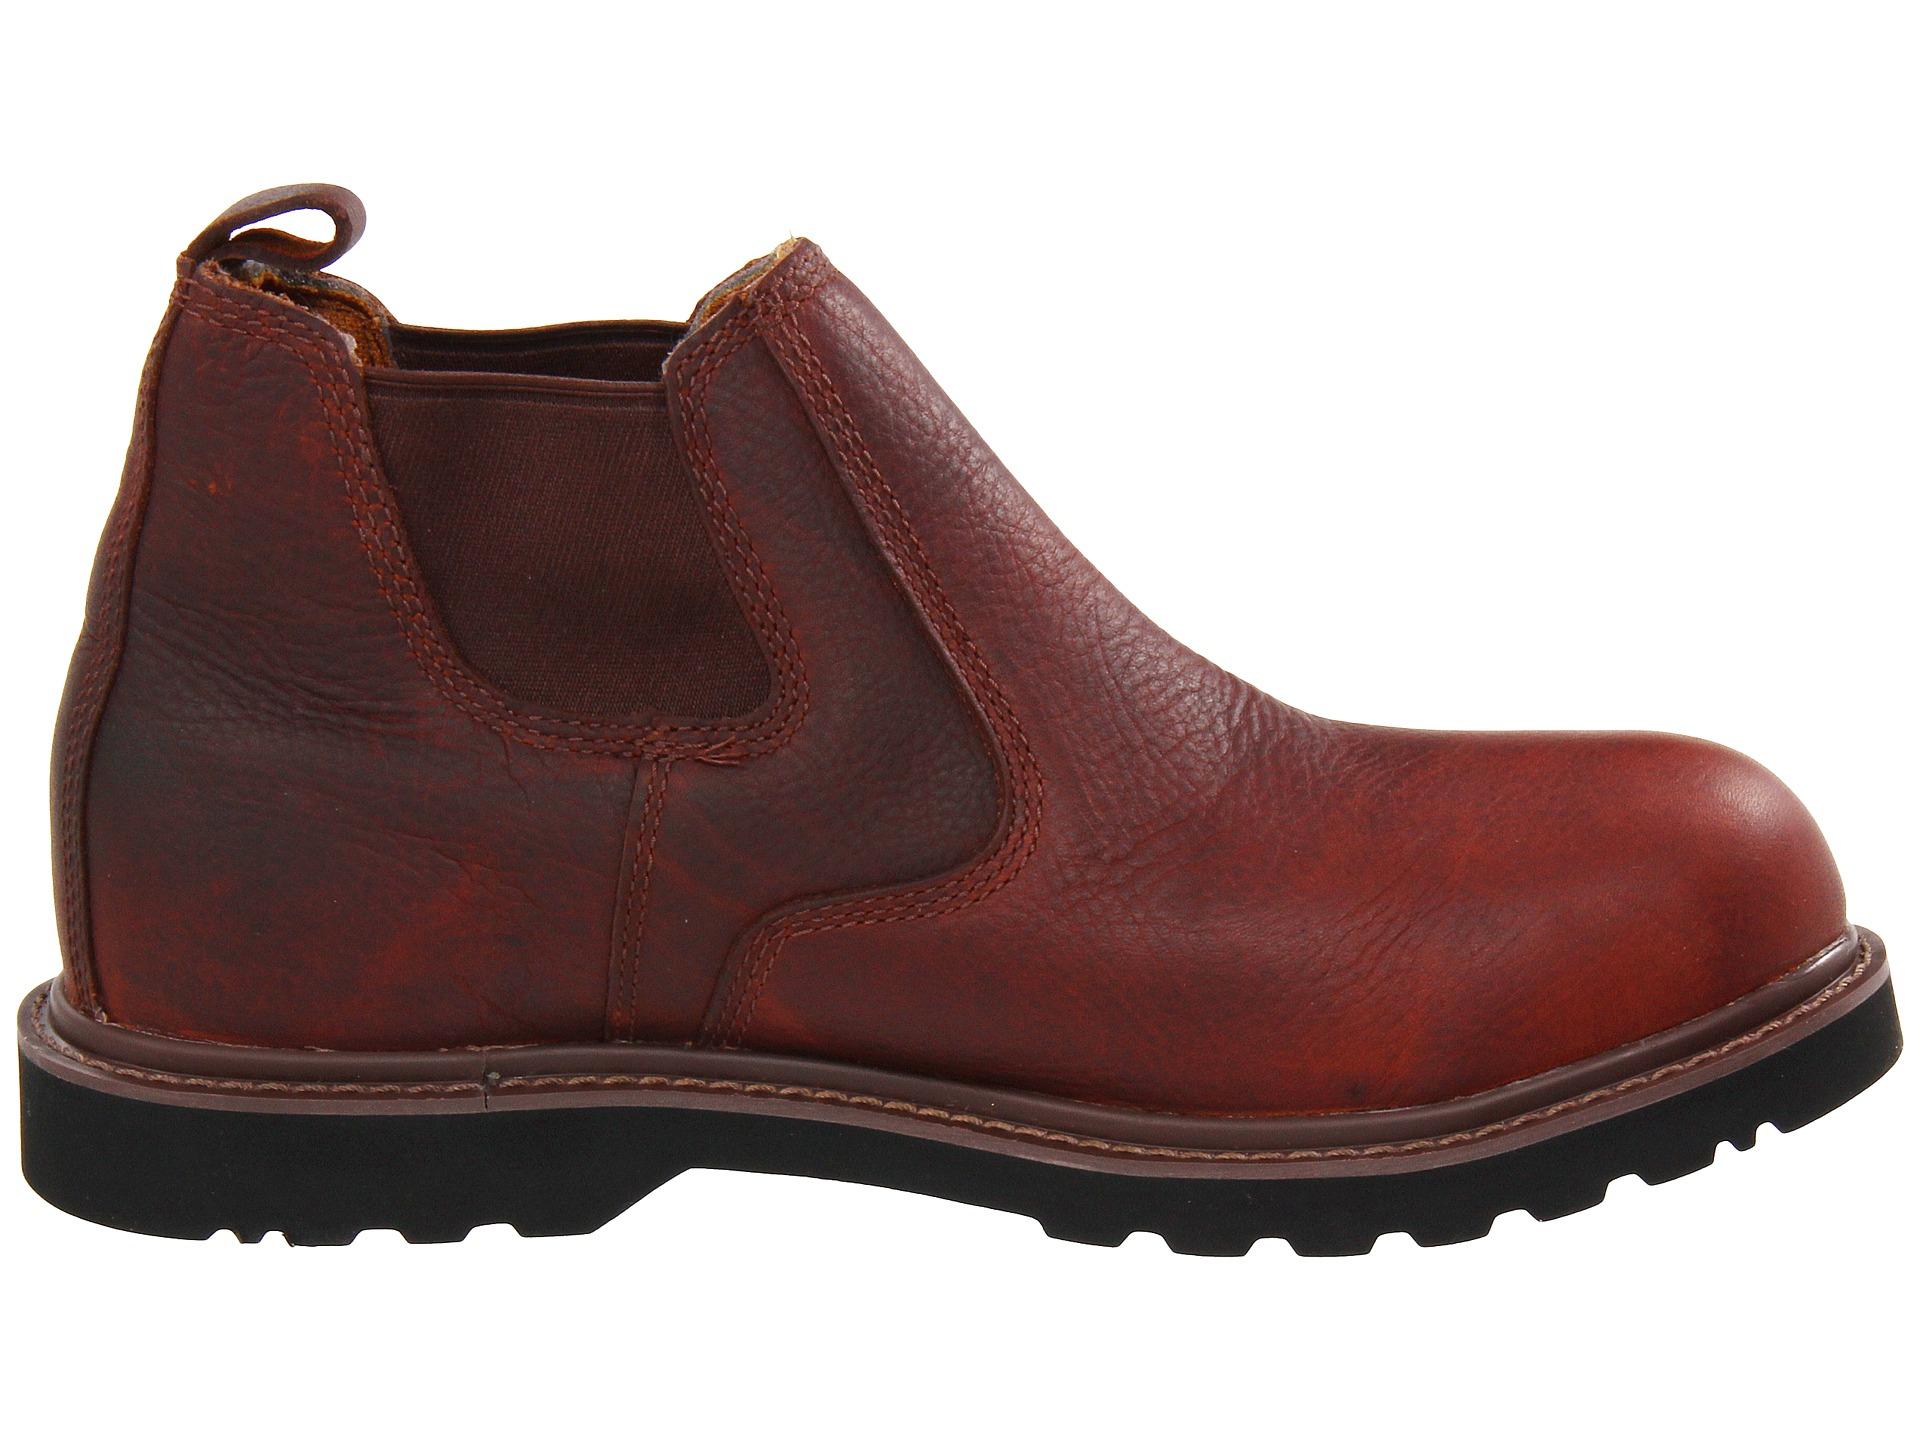 carhartt cms4100 4 quot romeo boot at zappos